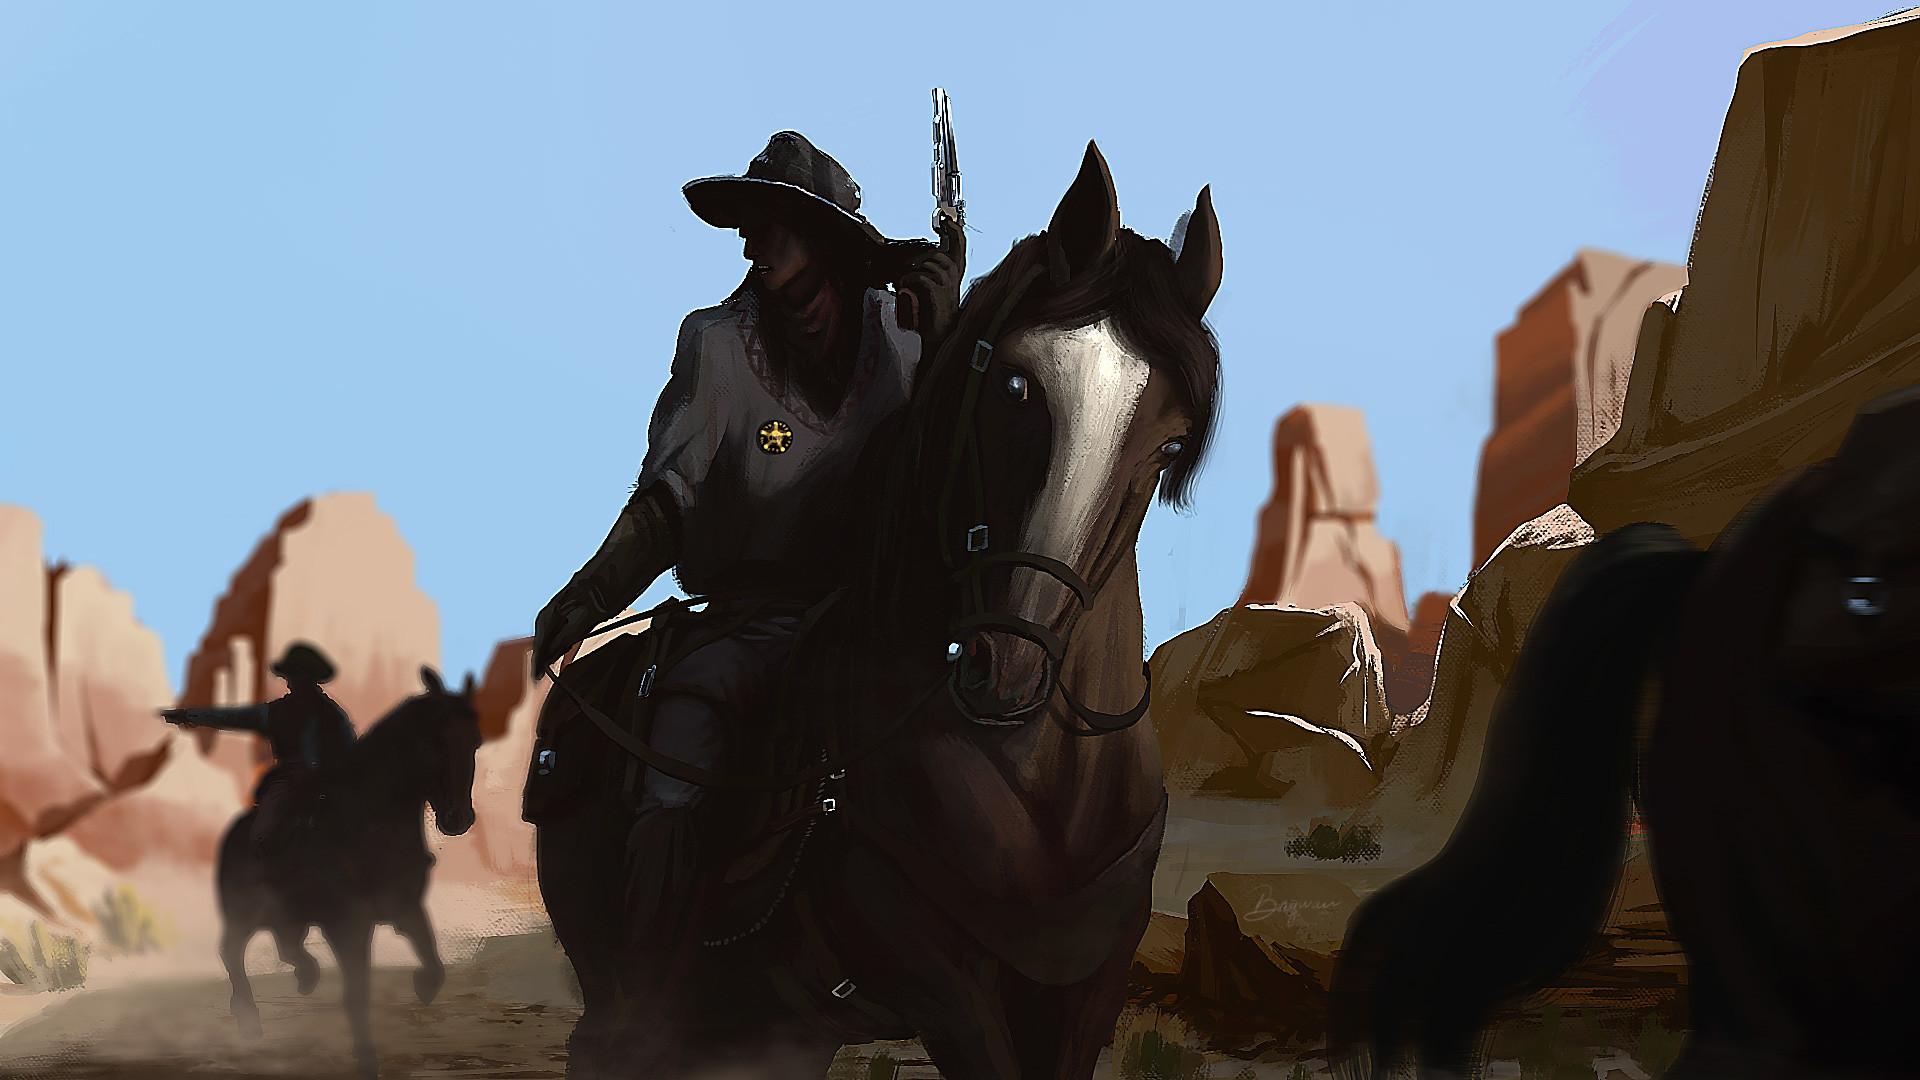 Nicolas chacin new sheriff